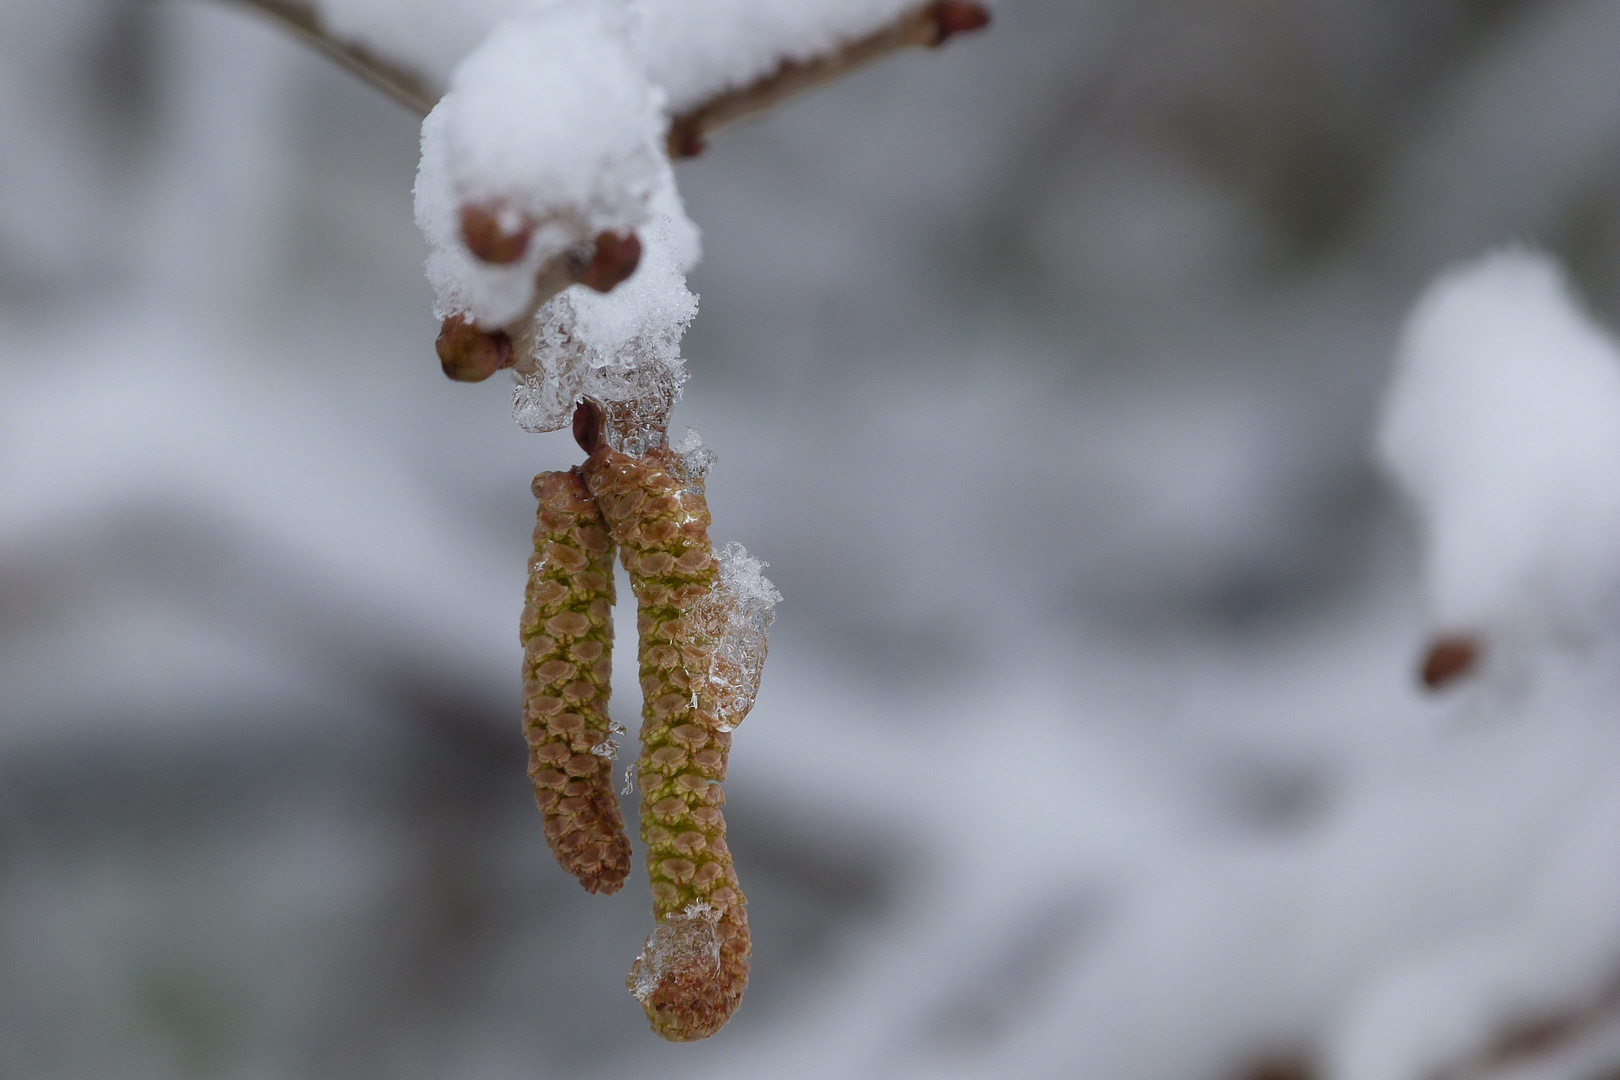 Schneeverziert